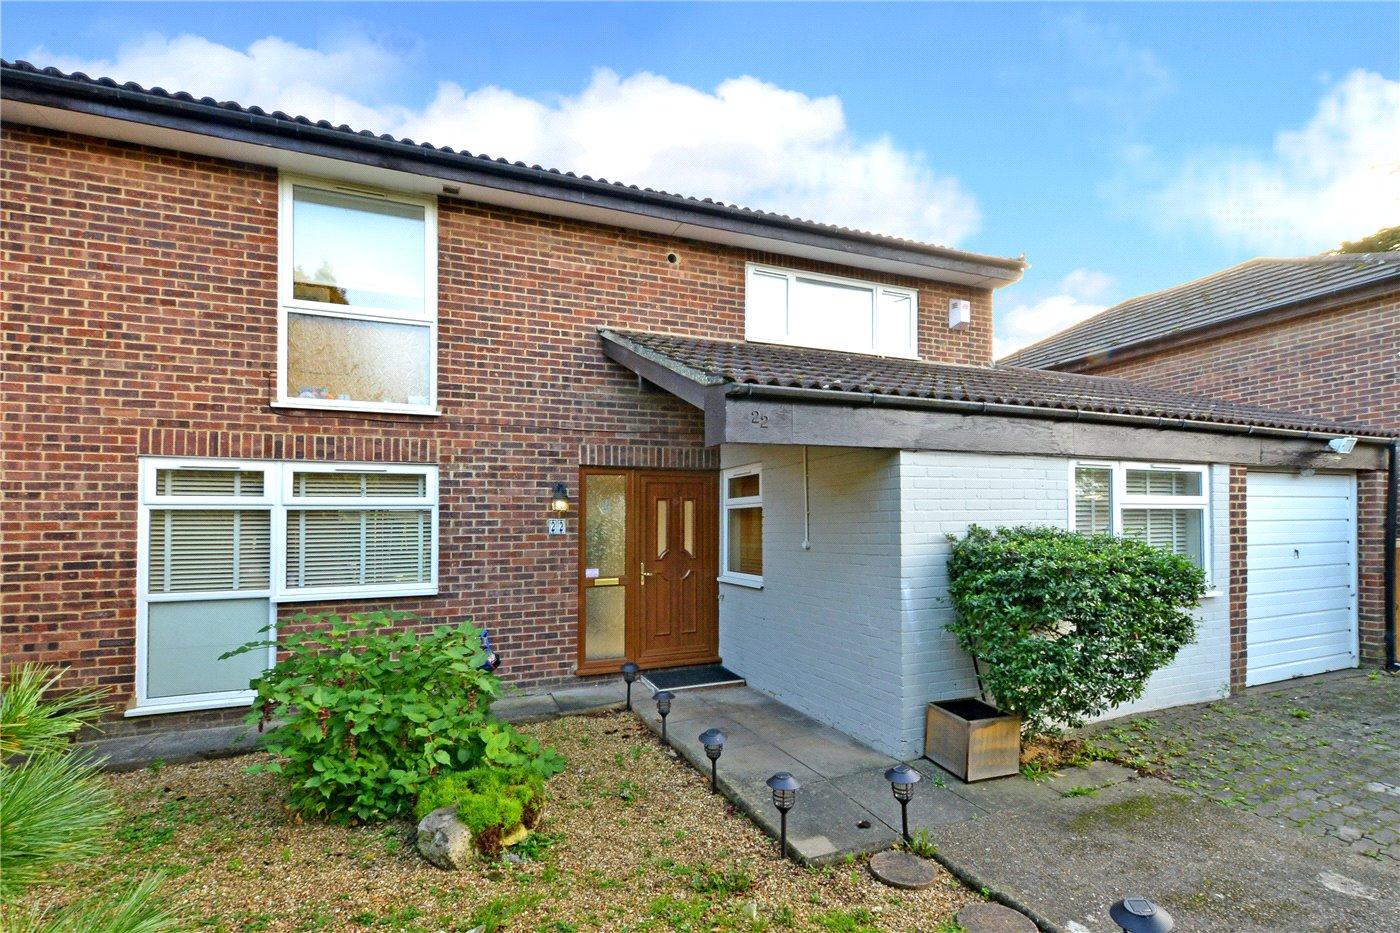 4 Bedrooms Detached House for sale in Drumaline Ridge, Worcester Park, KT4